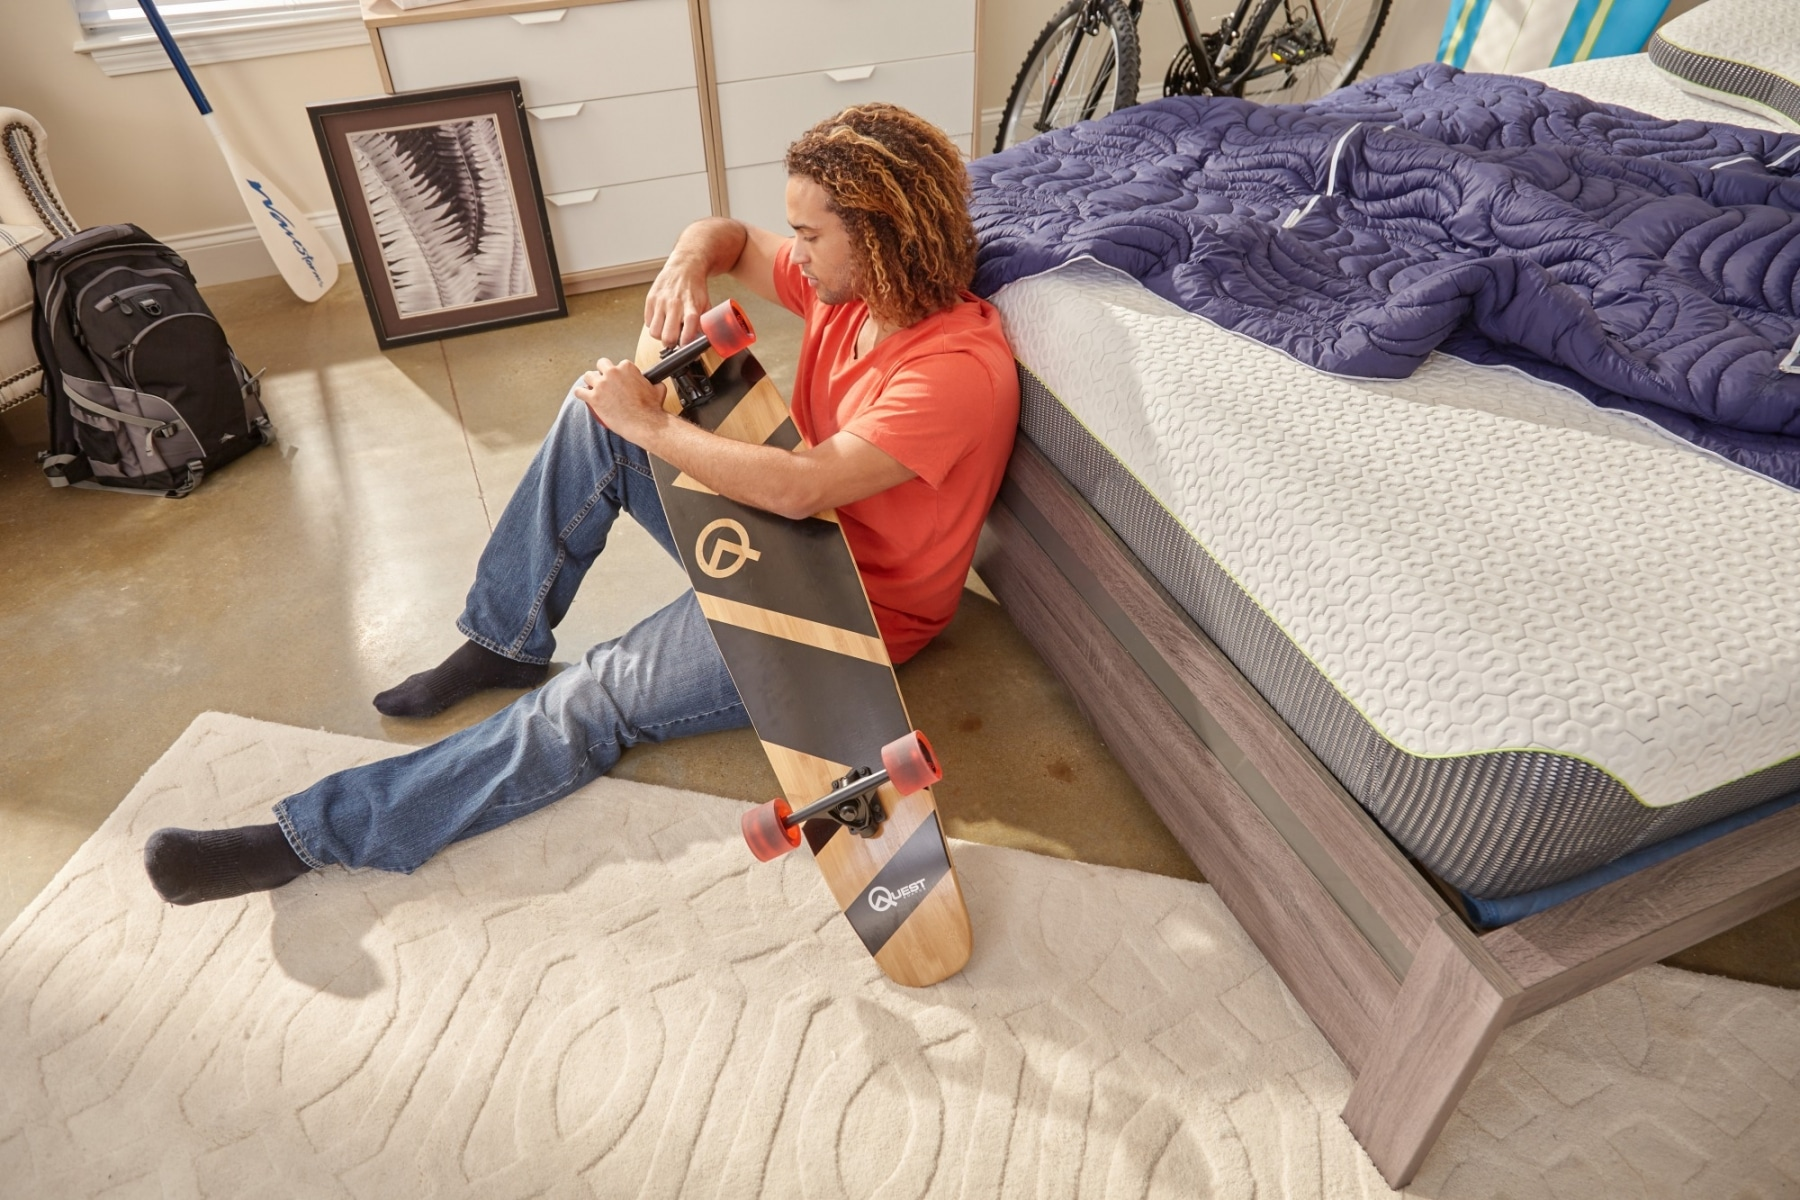 man sitting on floor with skateboard